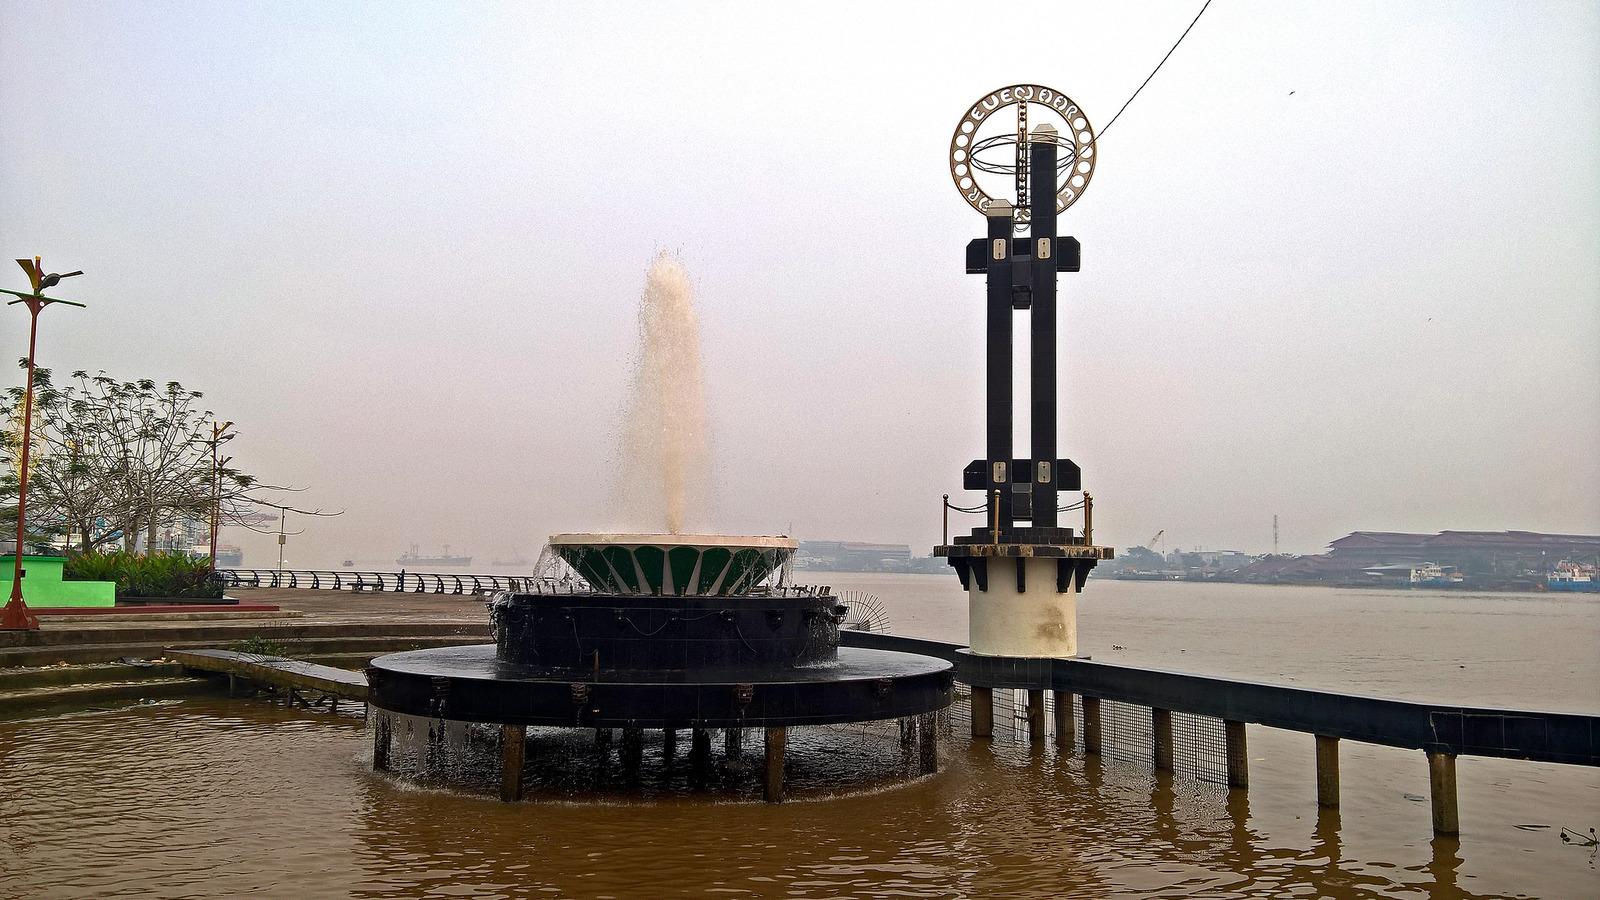 Bakanekobaka Oktober 2015 Air Mancur Tepi Sungai Ditata Maksimal Tentu